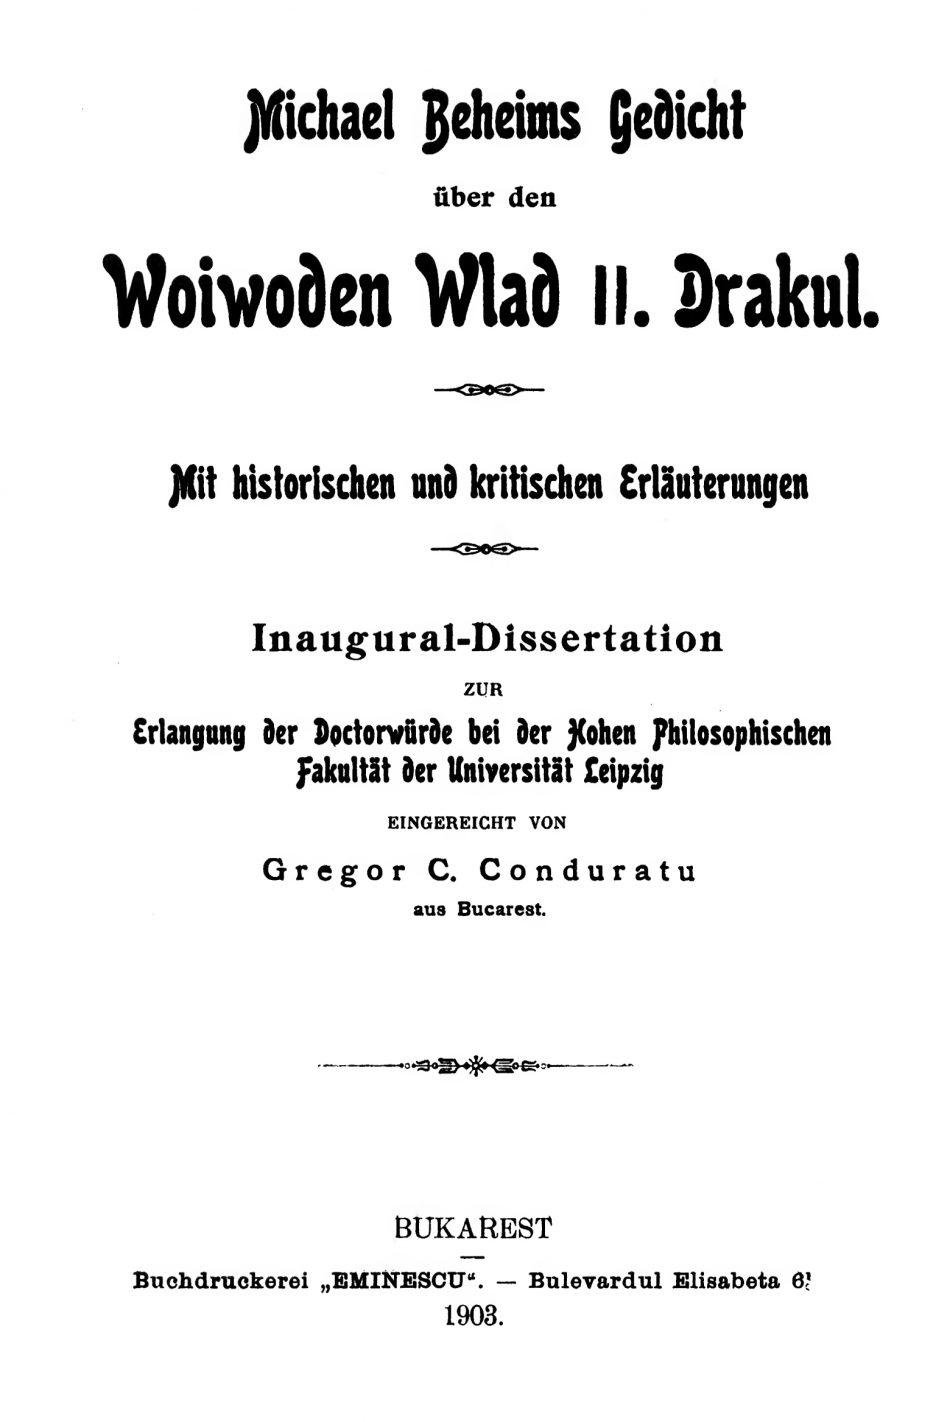 Title page of Conduratu's 1903 dissertation